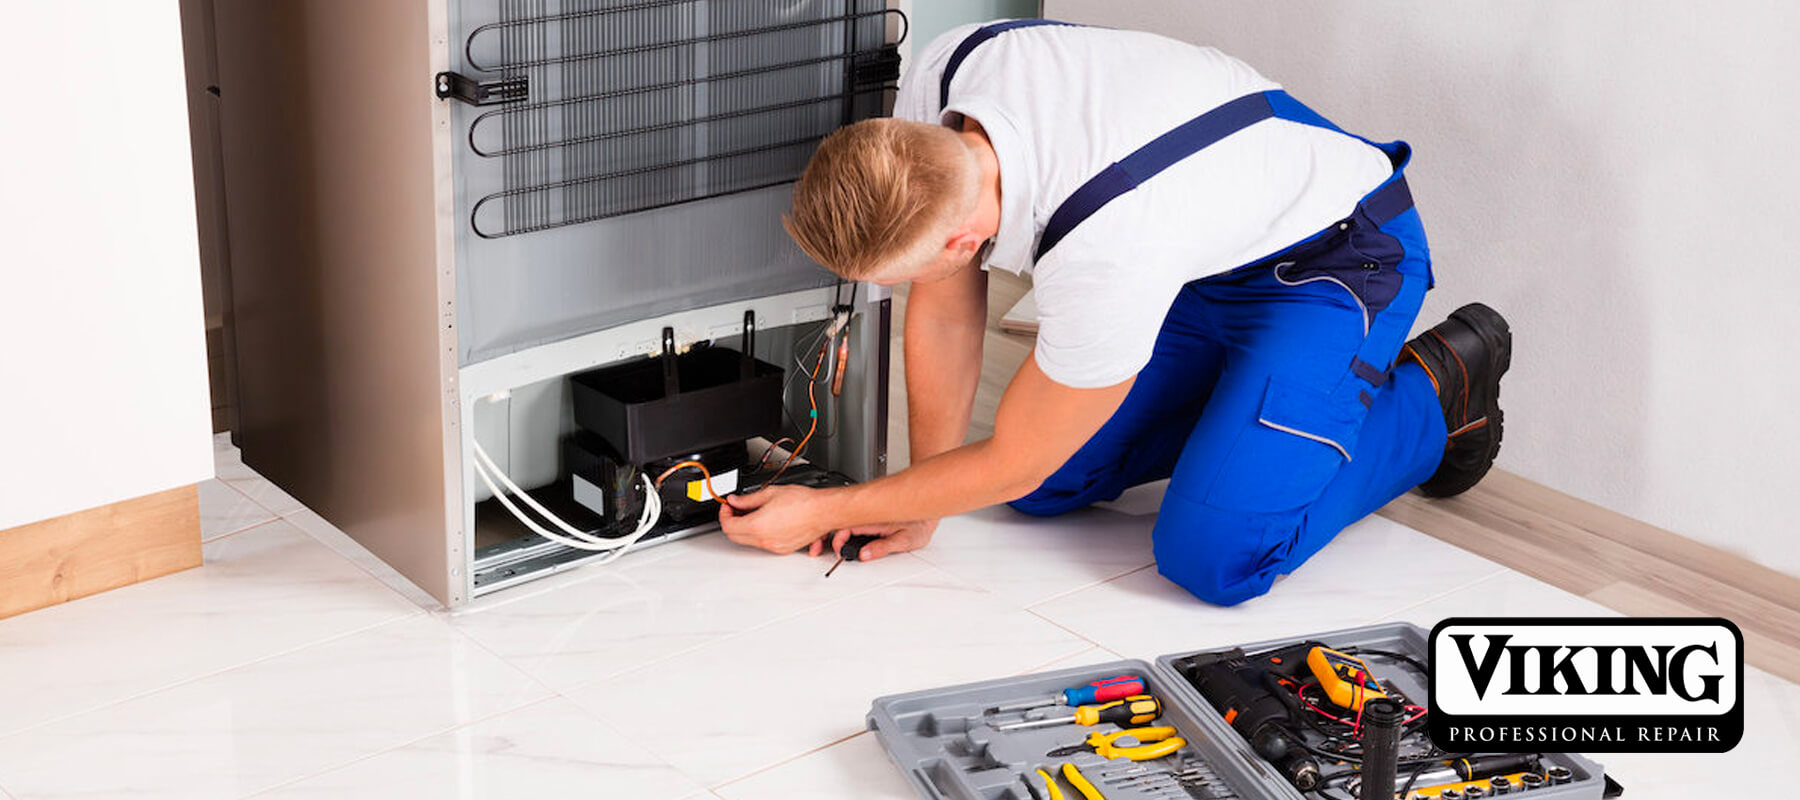 Authorized Viking Repair Palo Alto   Professional Viking Repair